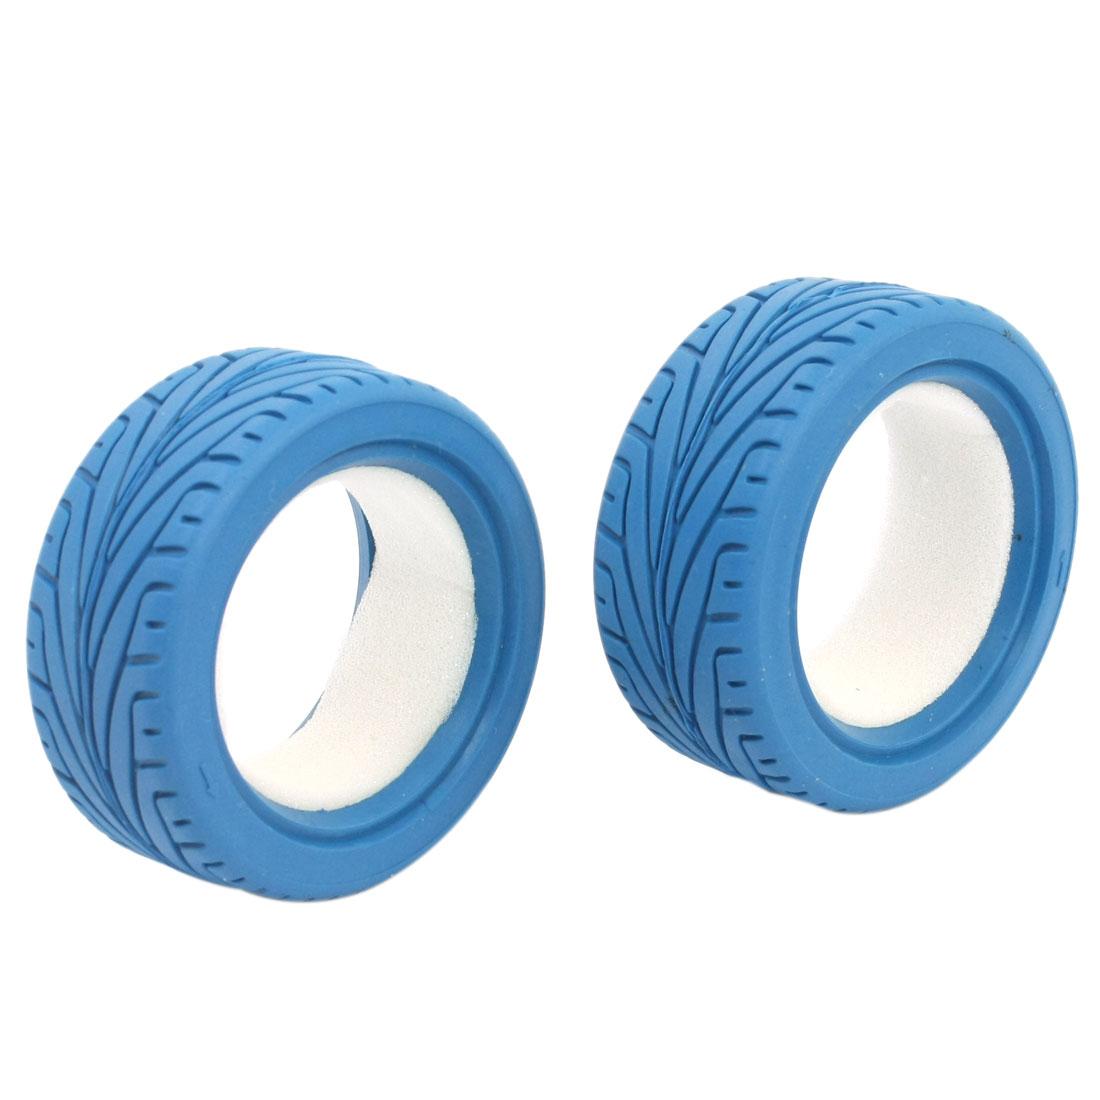 2pcs Blue DIY 1:10 Scale 65mm Wheel Tire for RC Model Flat Racing Car